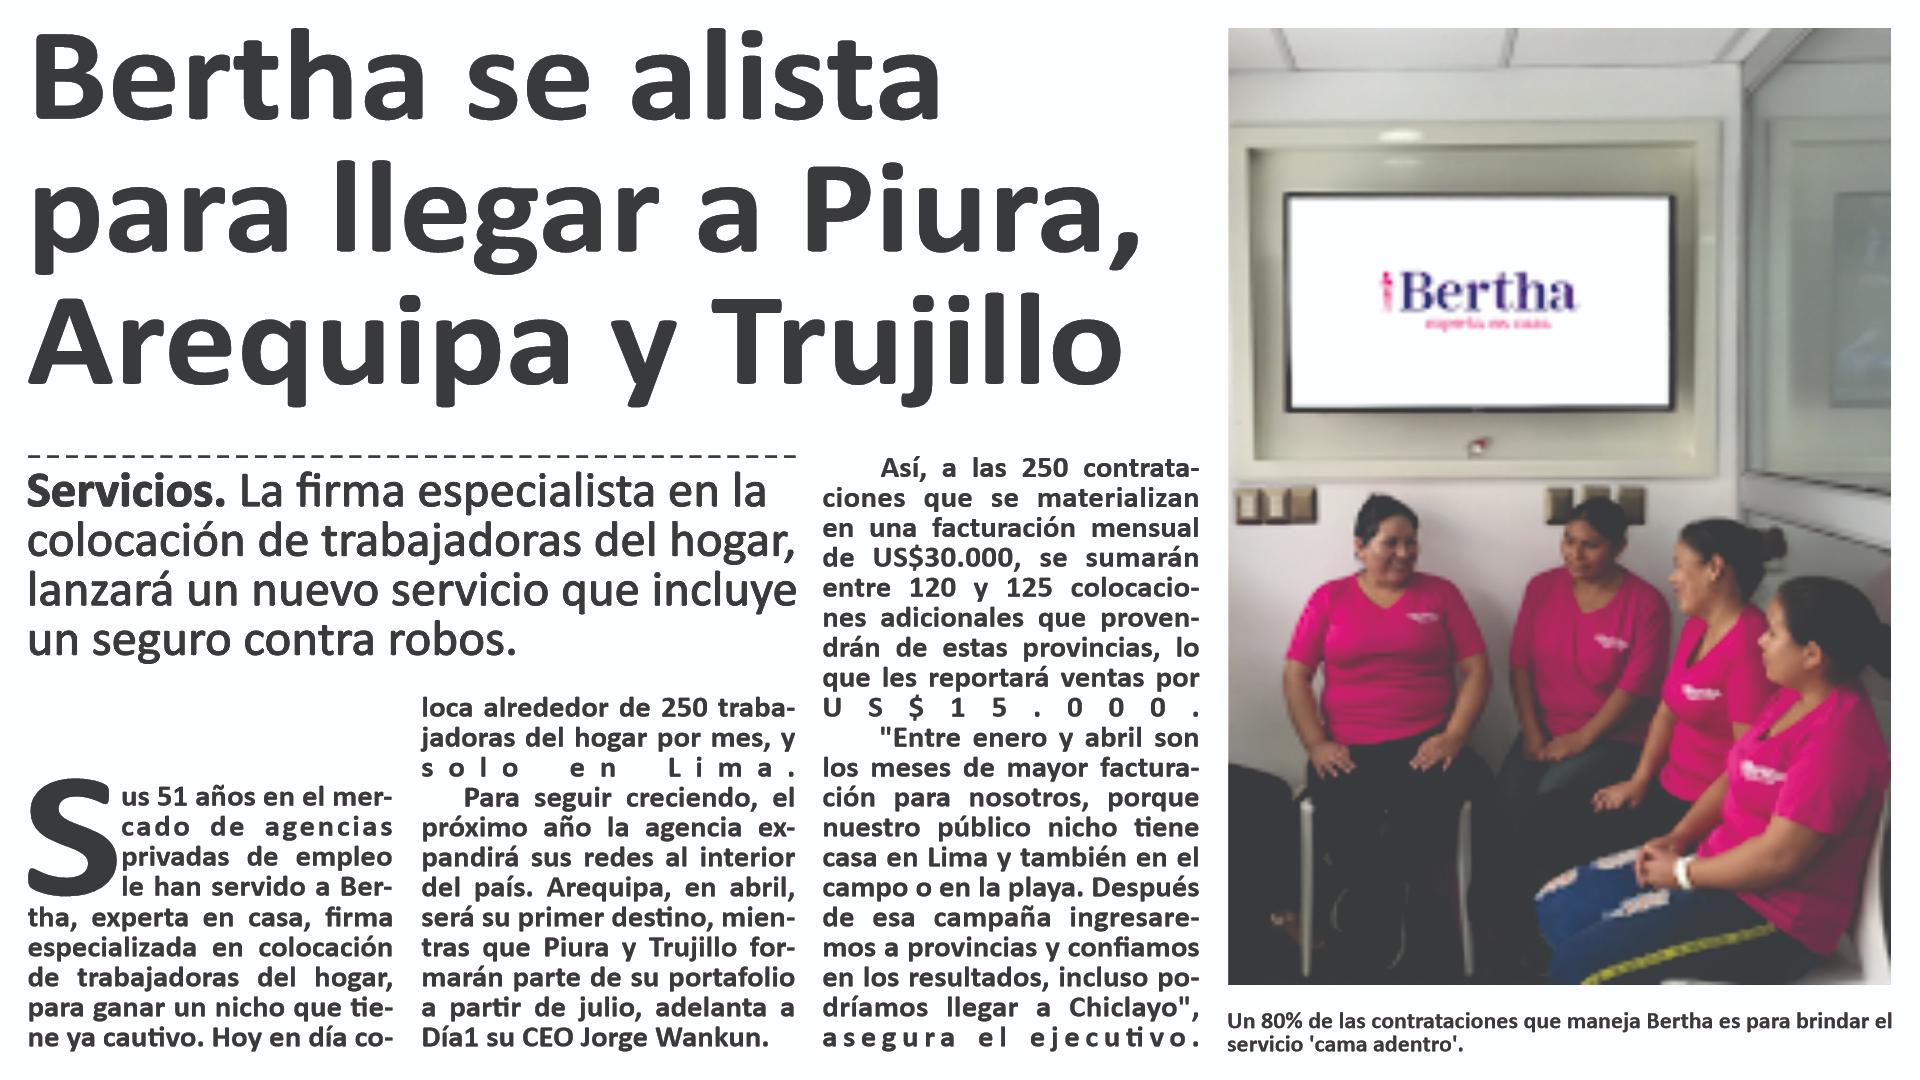 Bertha se alista para llegar a Piura, Arequipa y Trujillo